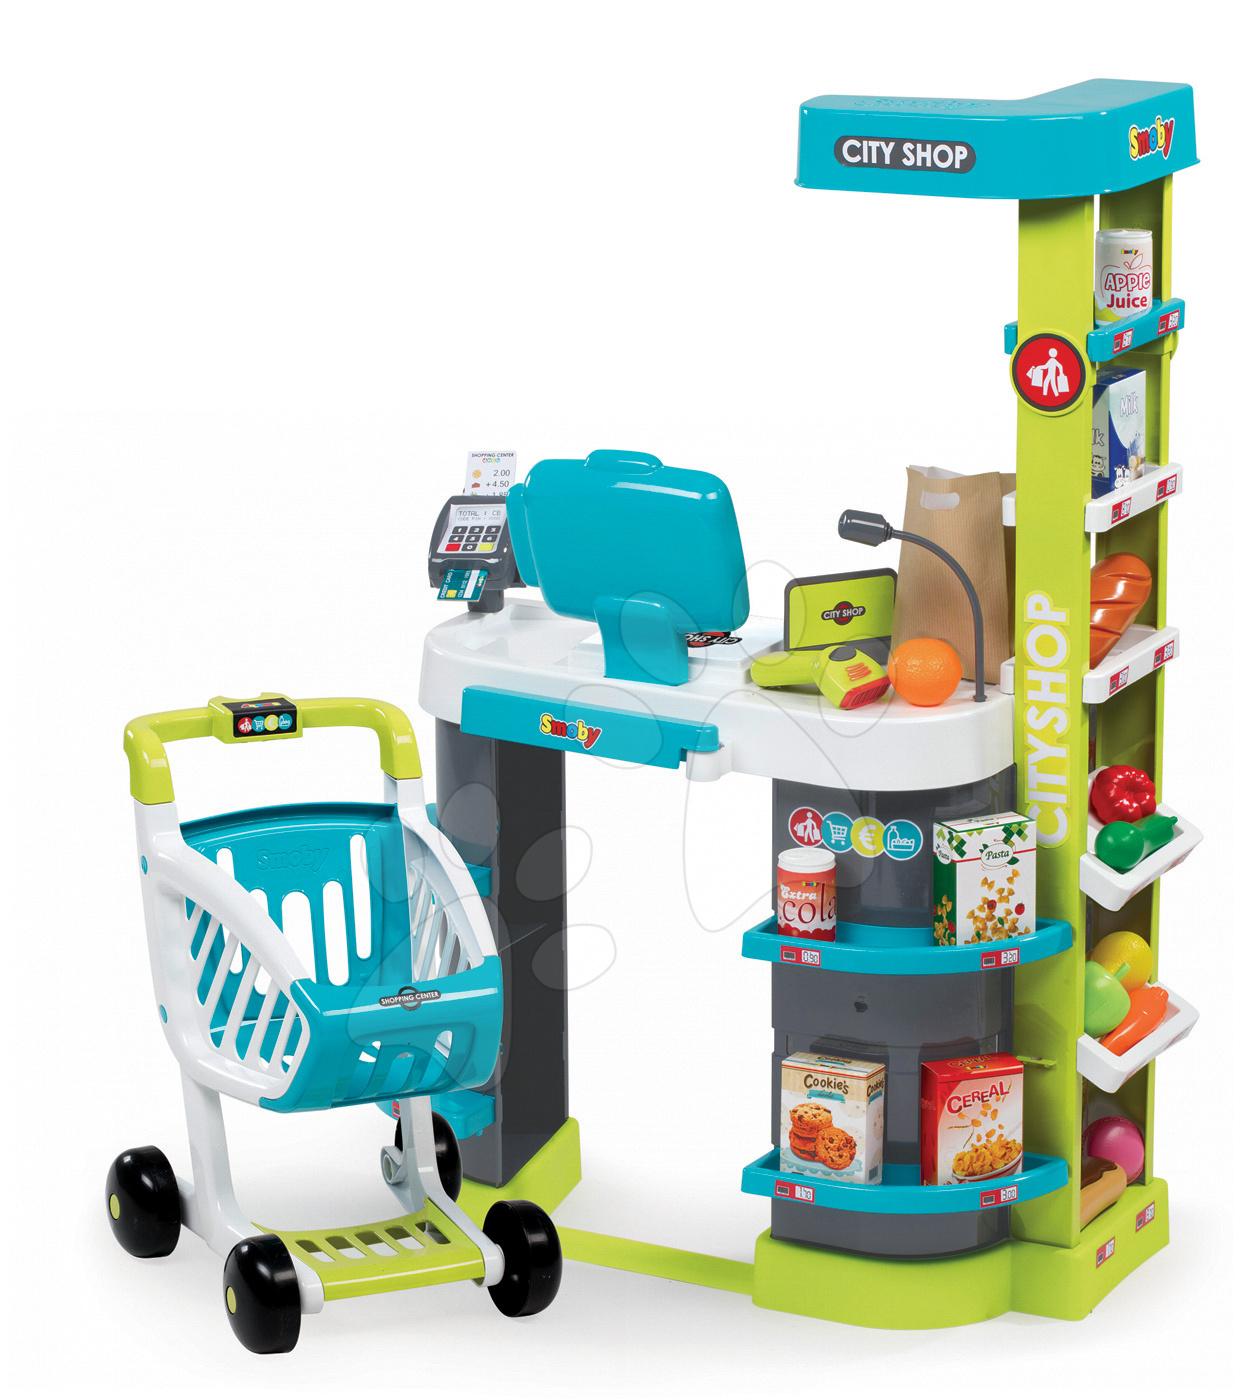 Obchod City Shop Smoby elektronický s pokladňou, potravinami a 41 doplnkami tyrkysový